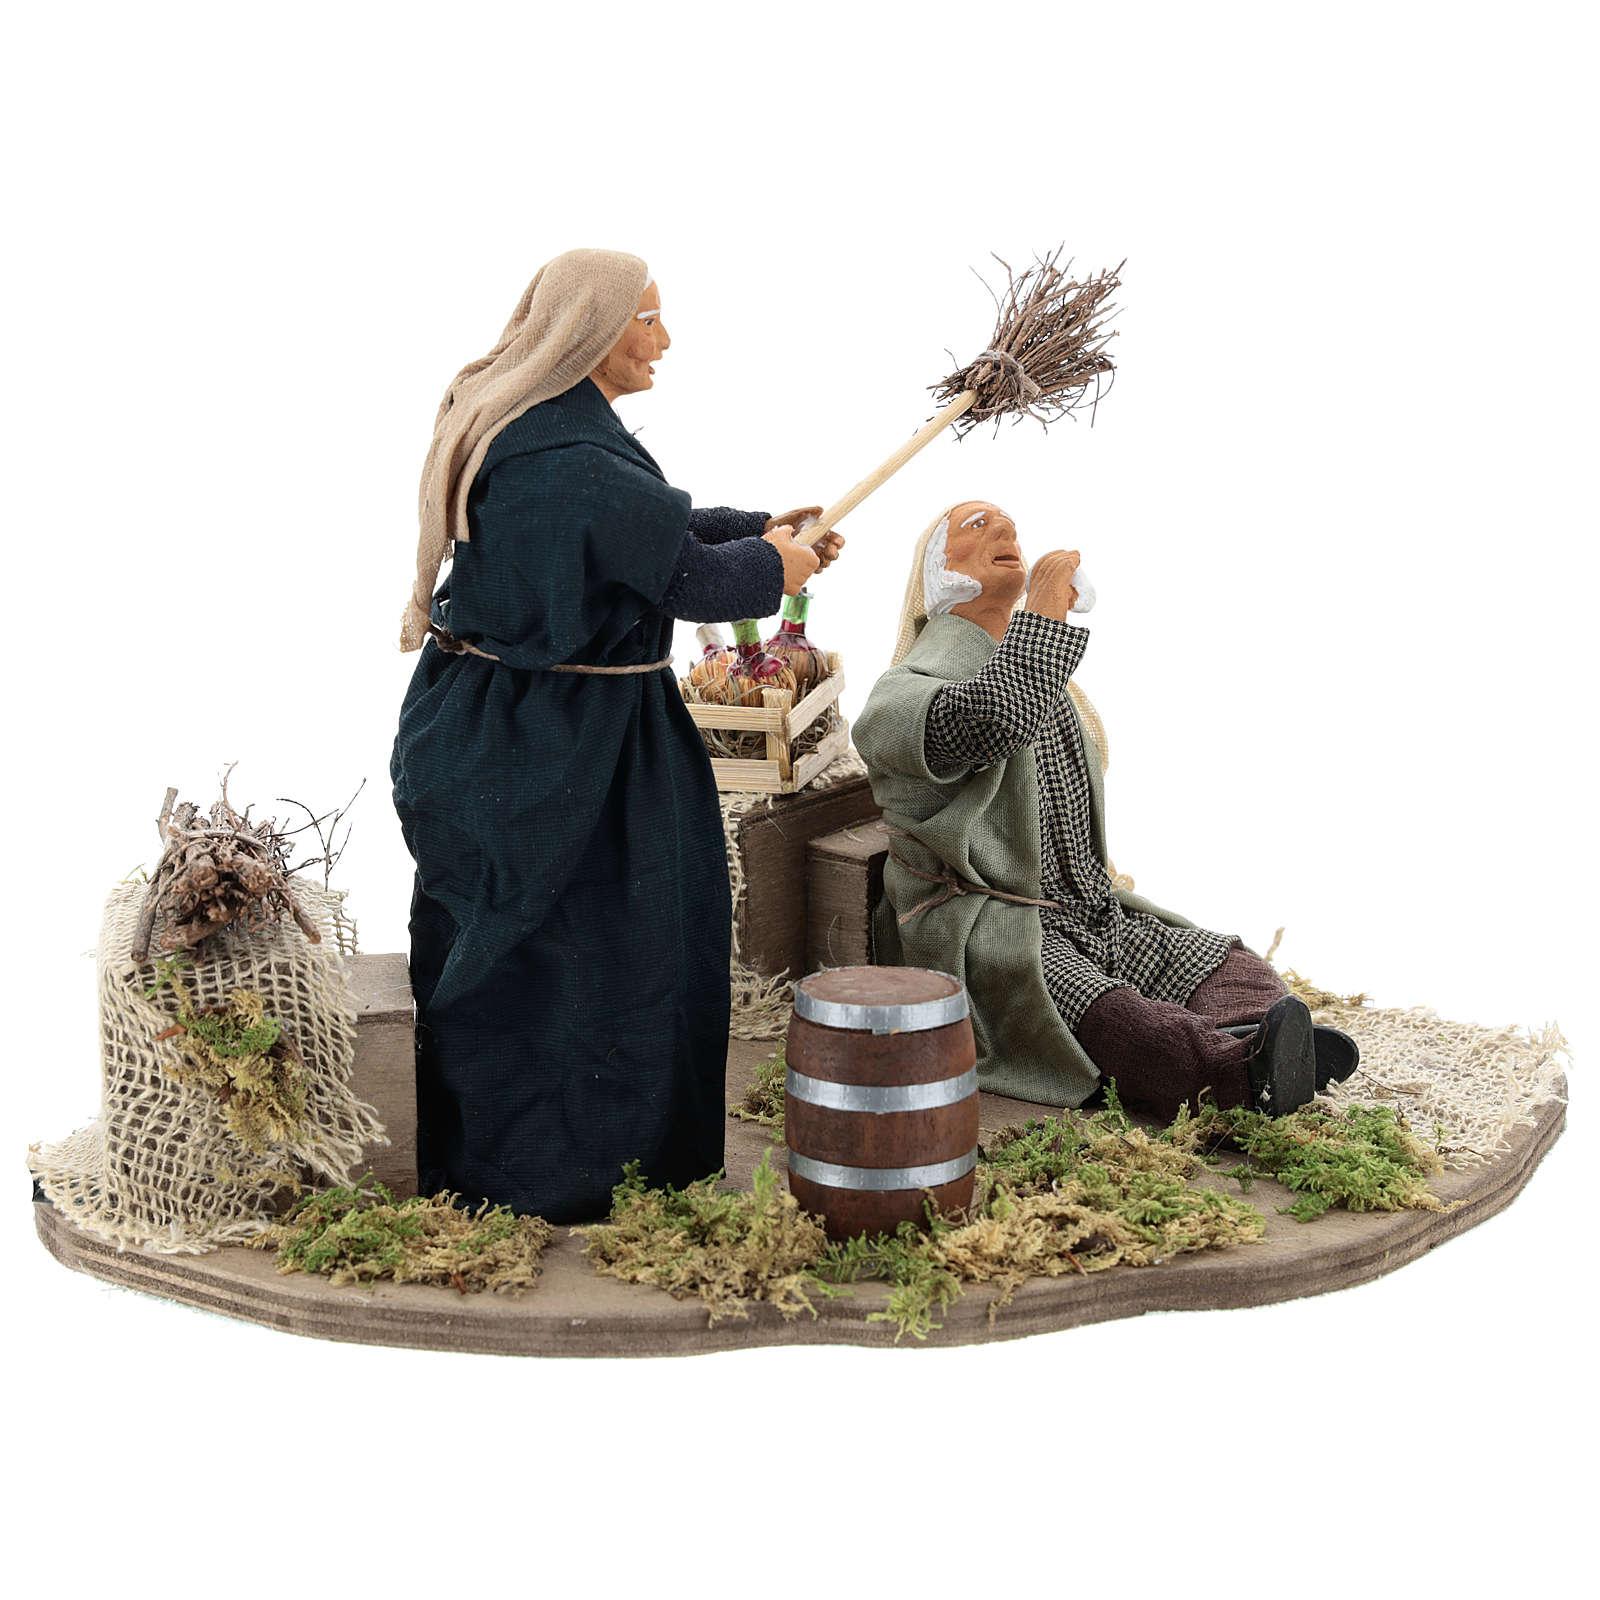 Drunkard and Woman with broom 14cm neapolitan animated Nativity 4